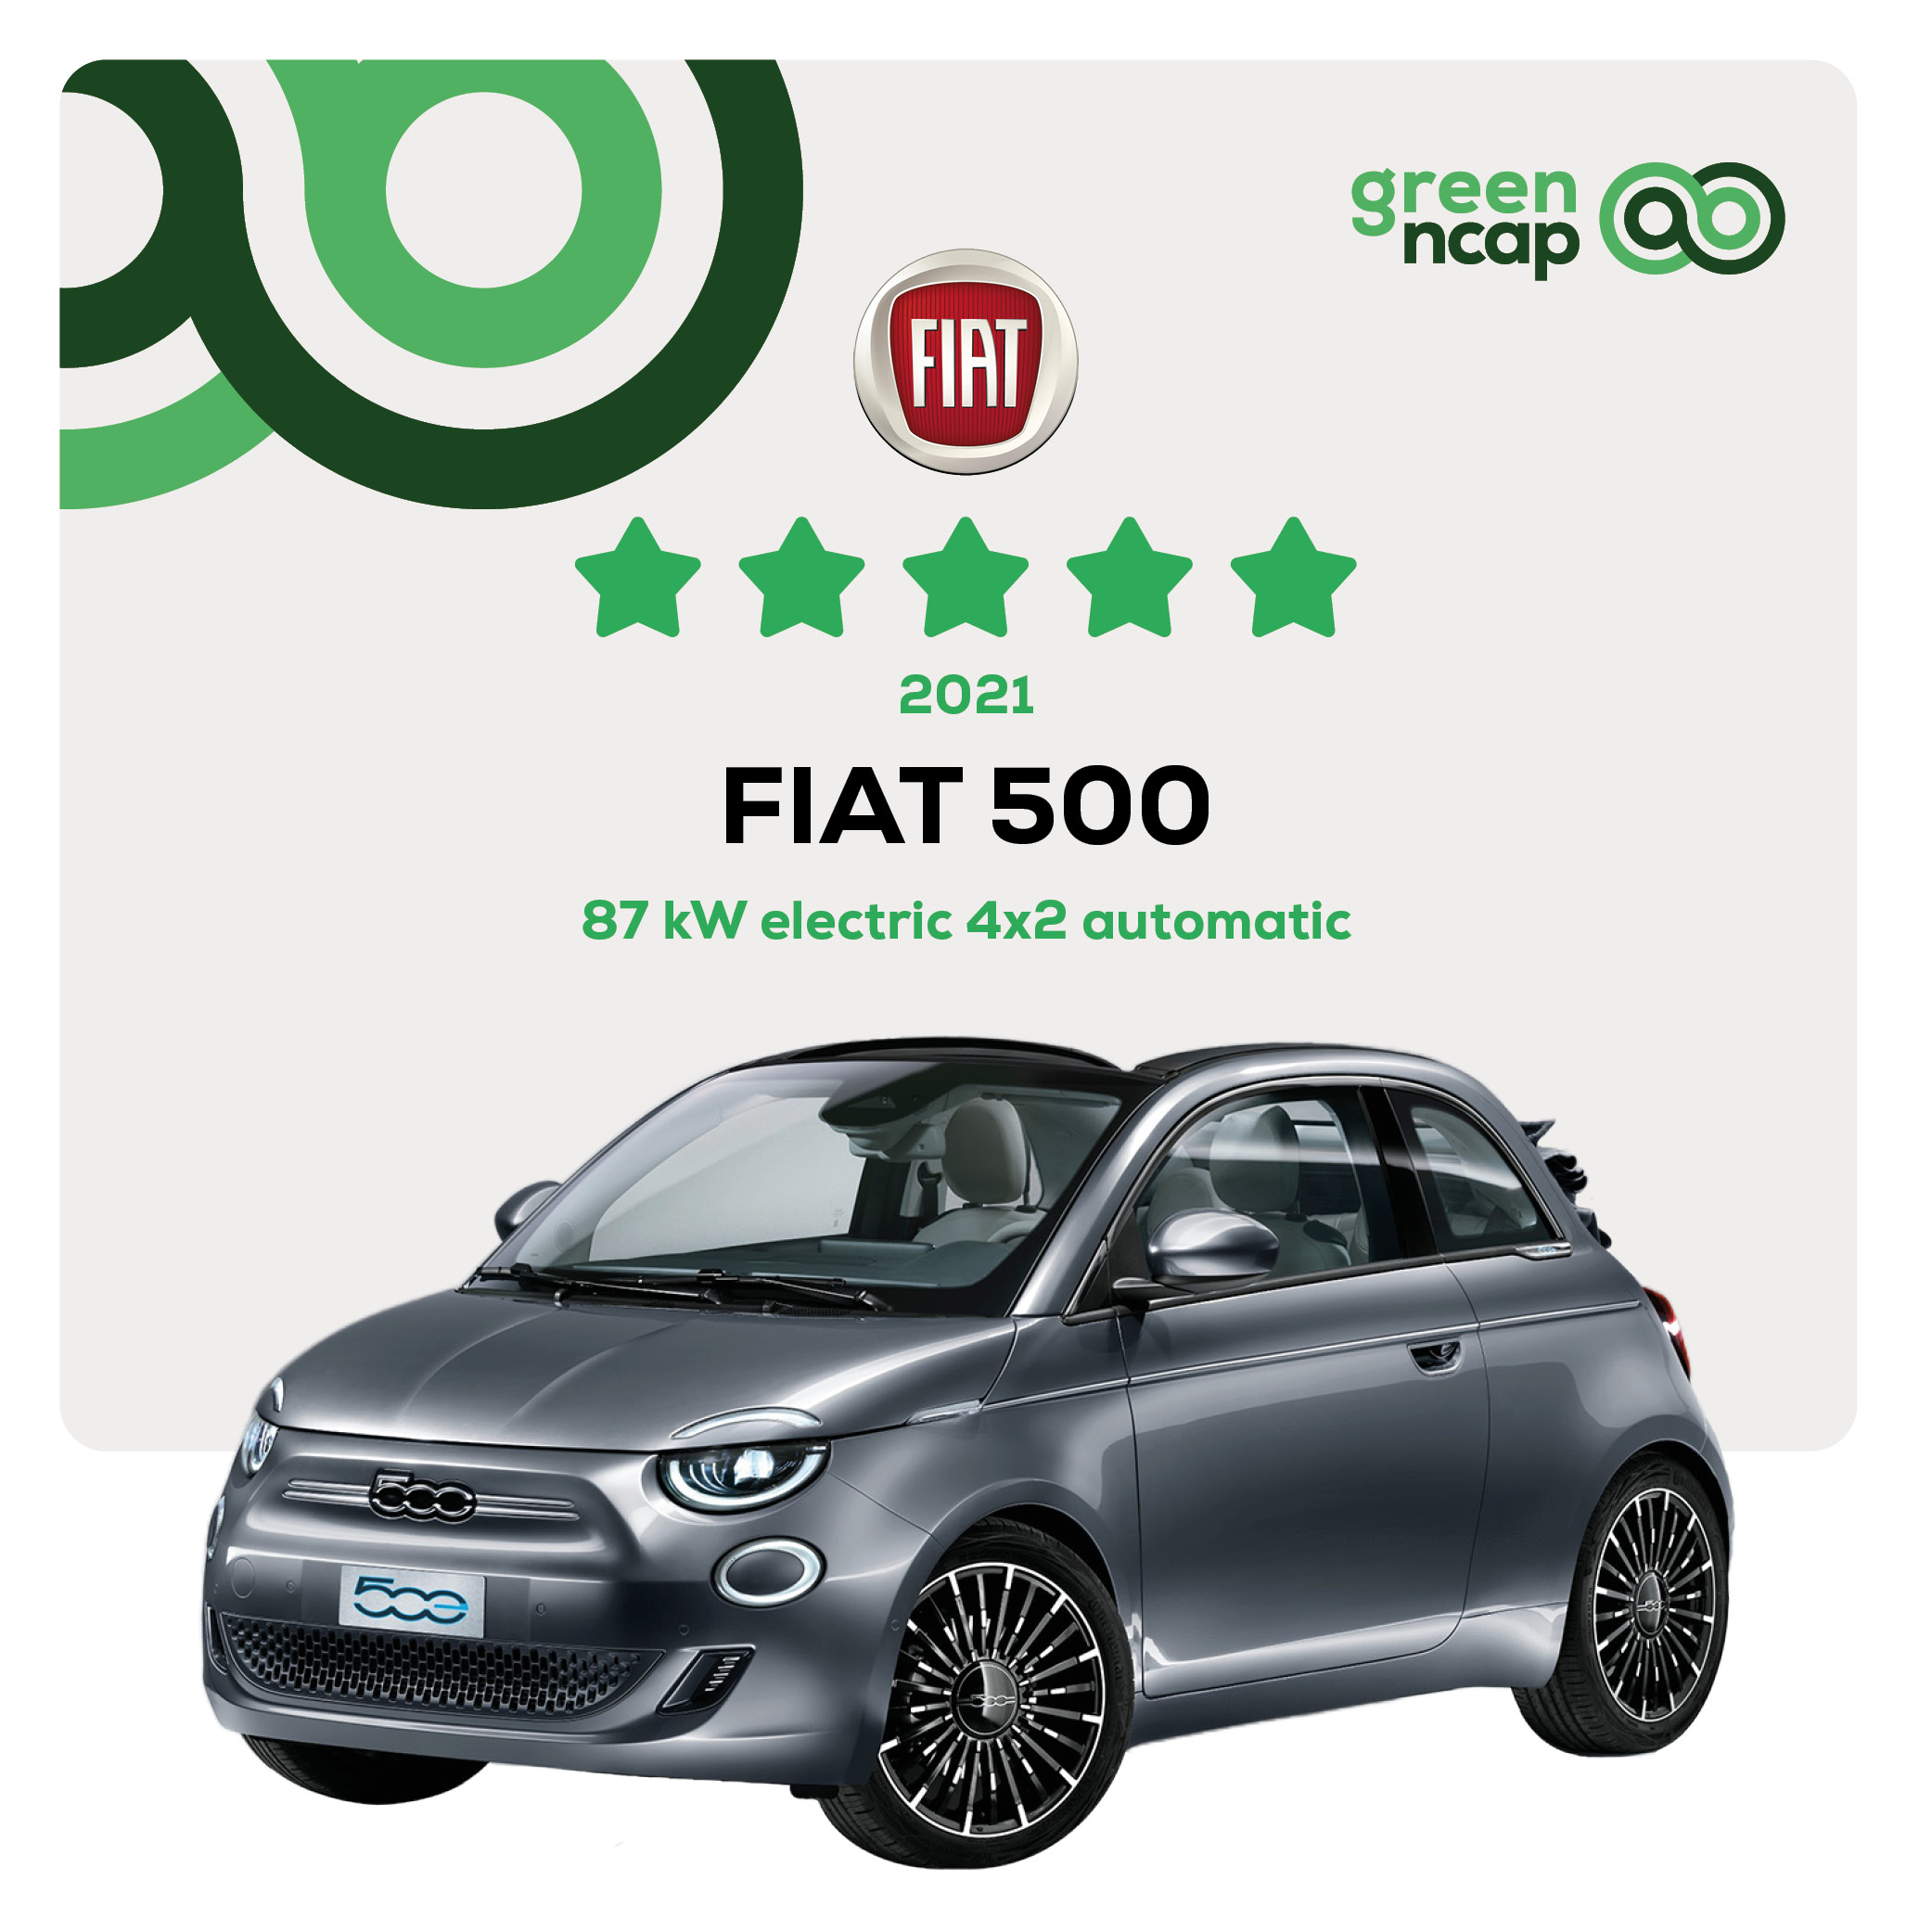 FIAT 500 - Green NCAP Results July 2021 - 5 stars